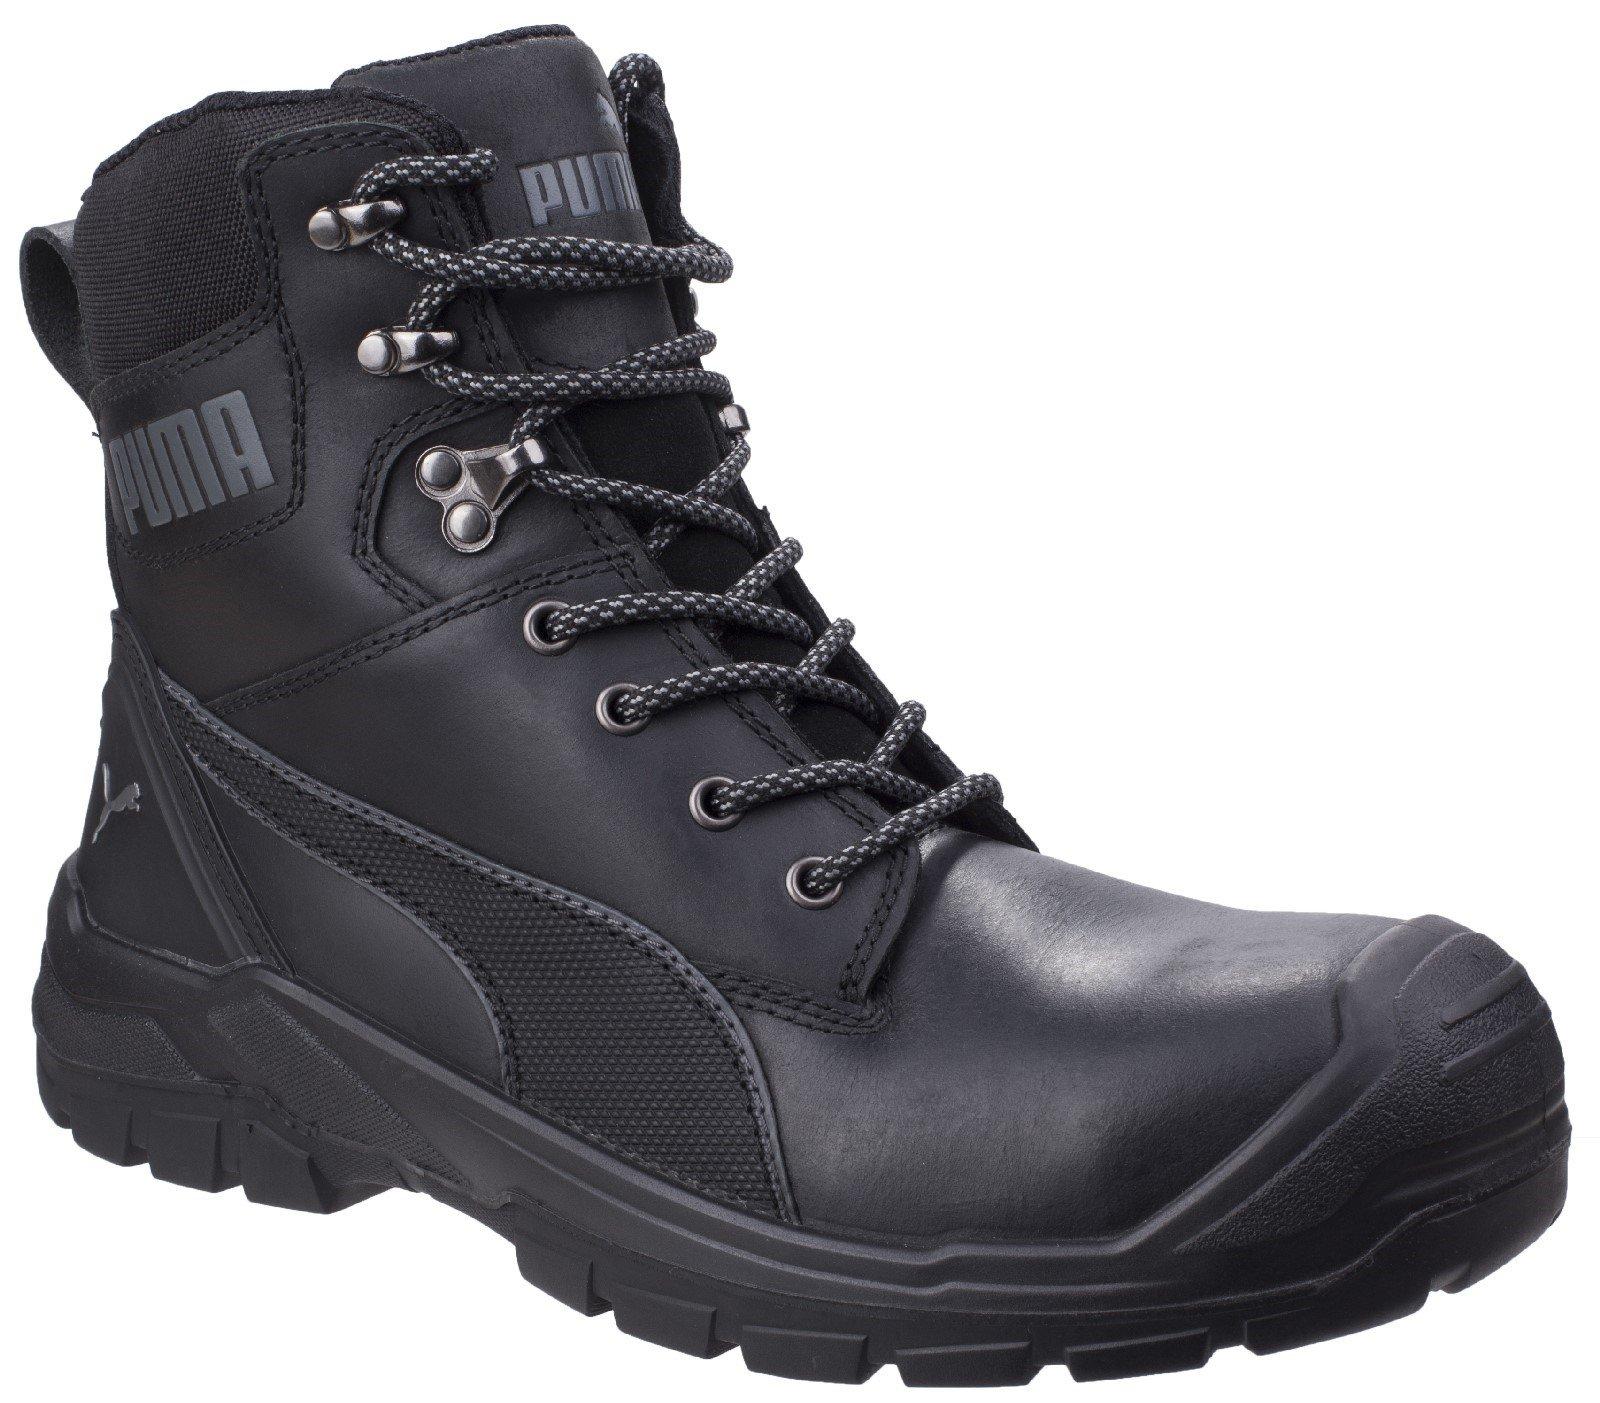 Puma Safety Unisex Conquest 630730 High Boot Black 27285 - Black 6.5